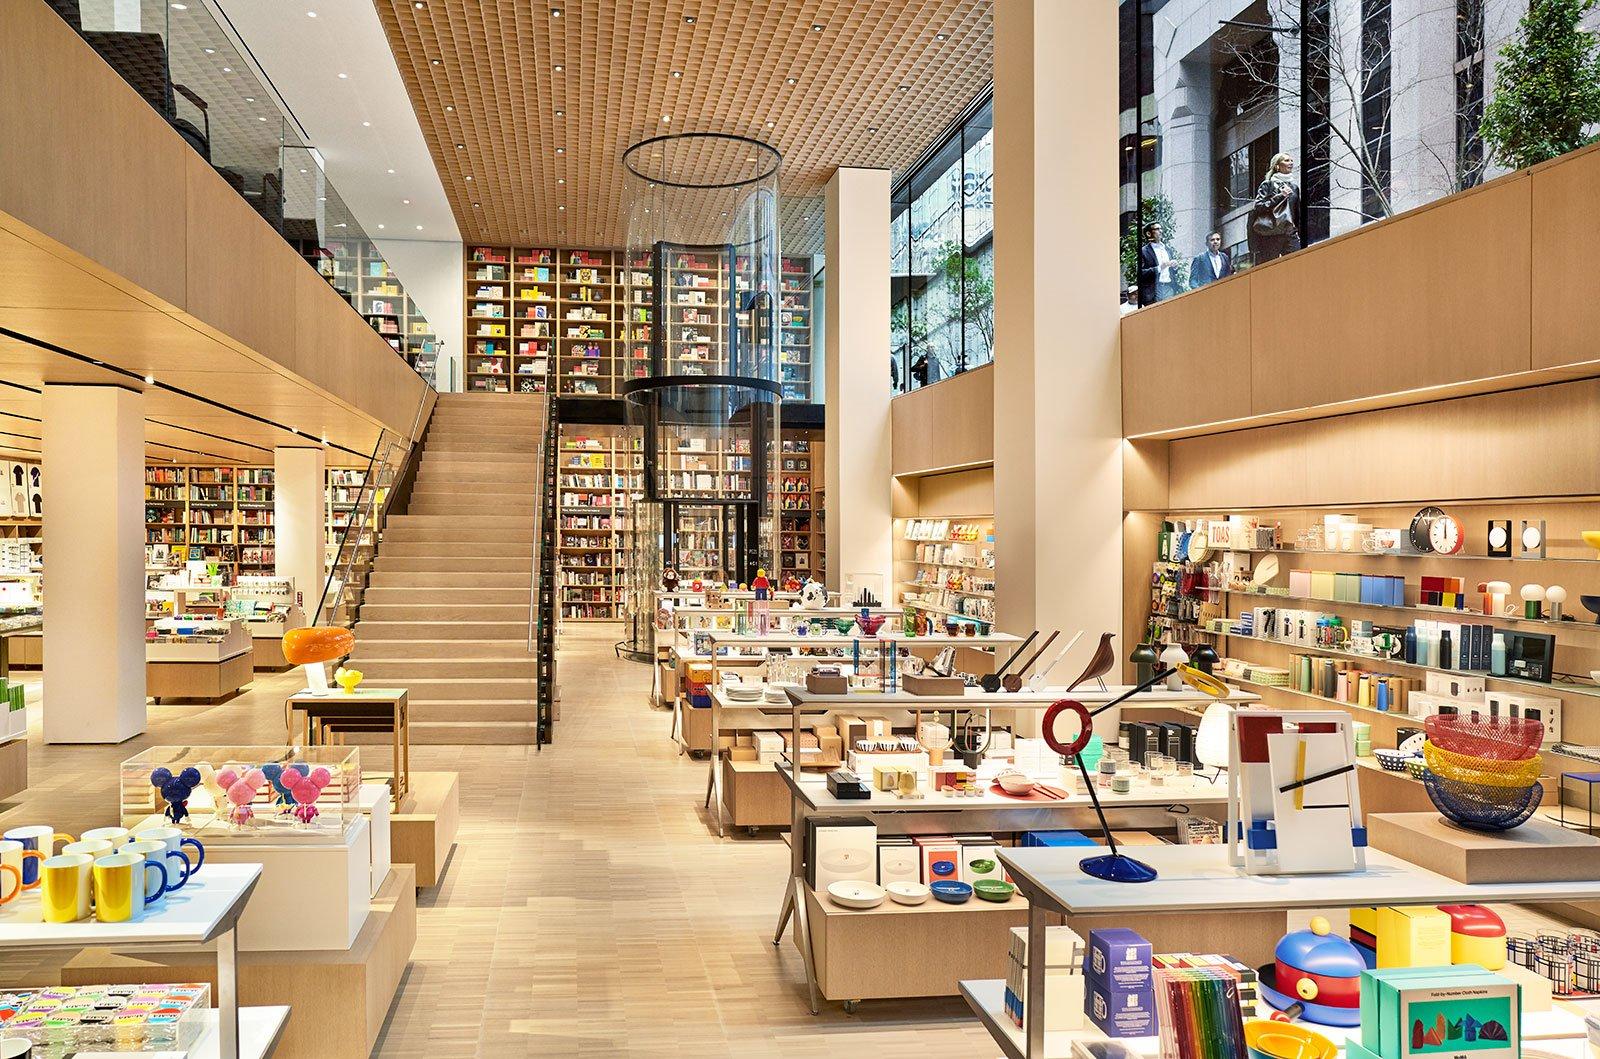 MOMA retail store